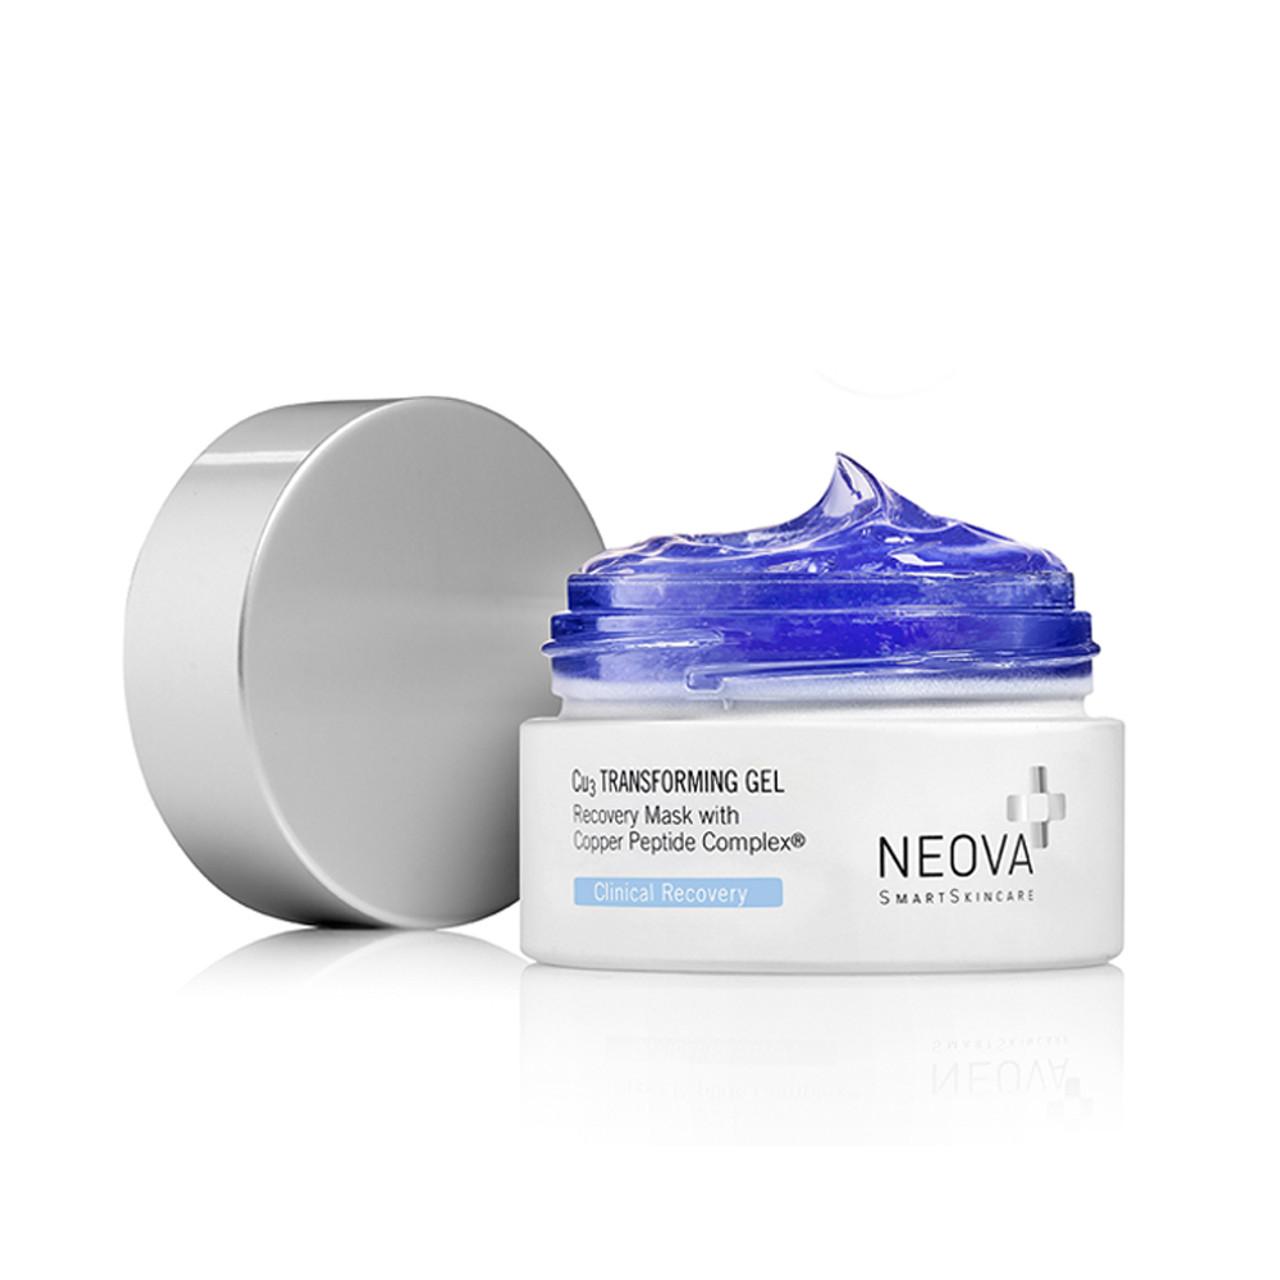 Neova Cu3 Transforming Gel Recovery Mask BeautifiedYou.com